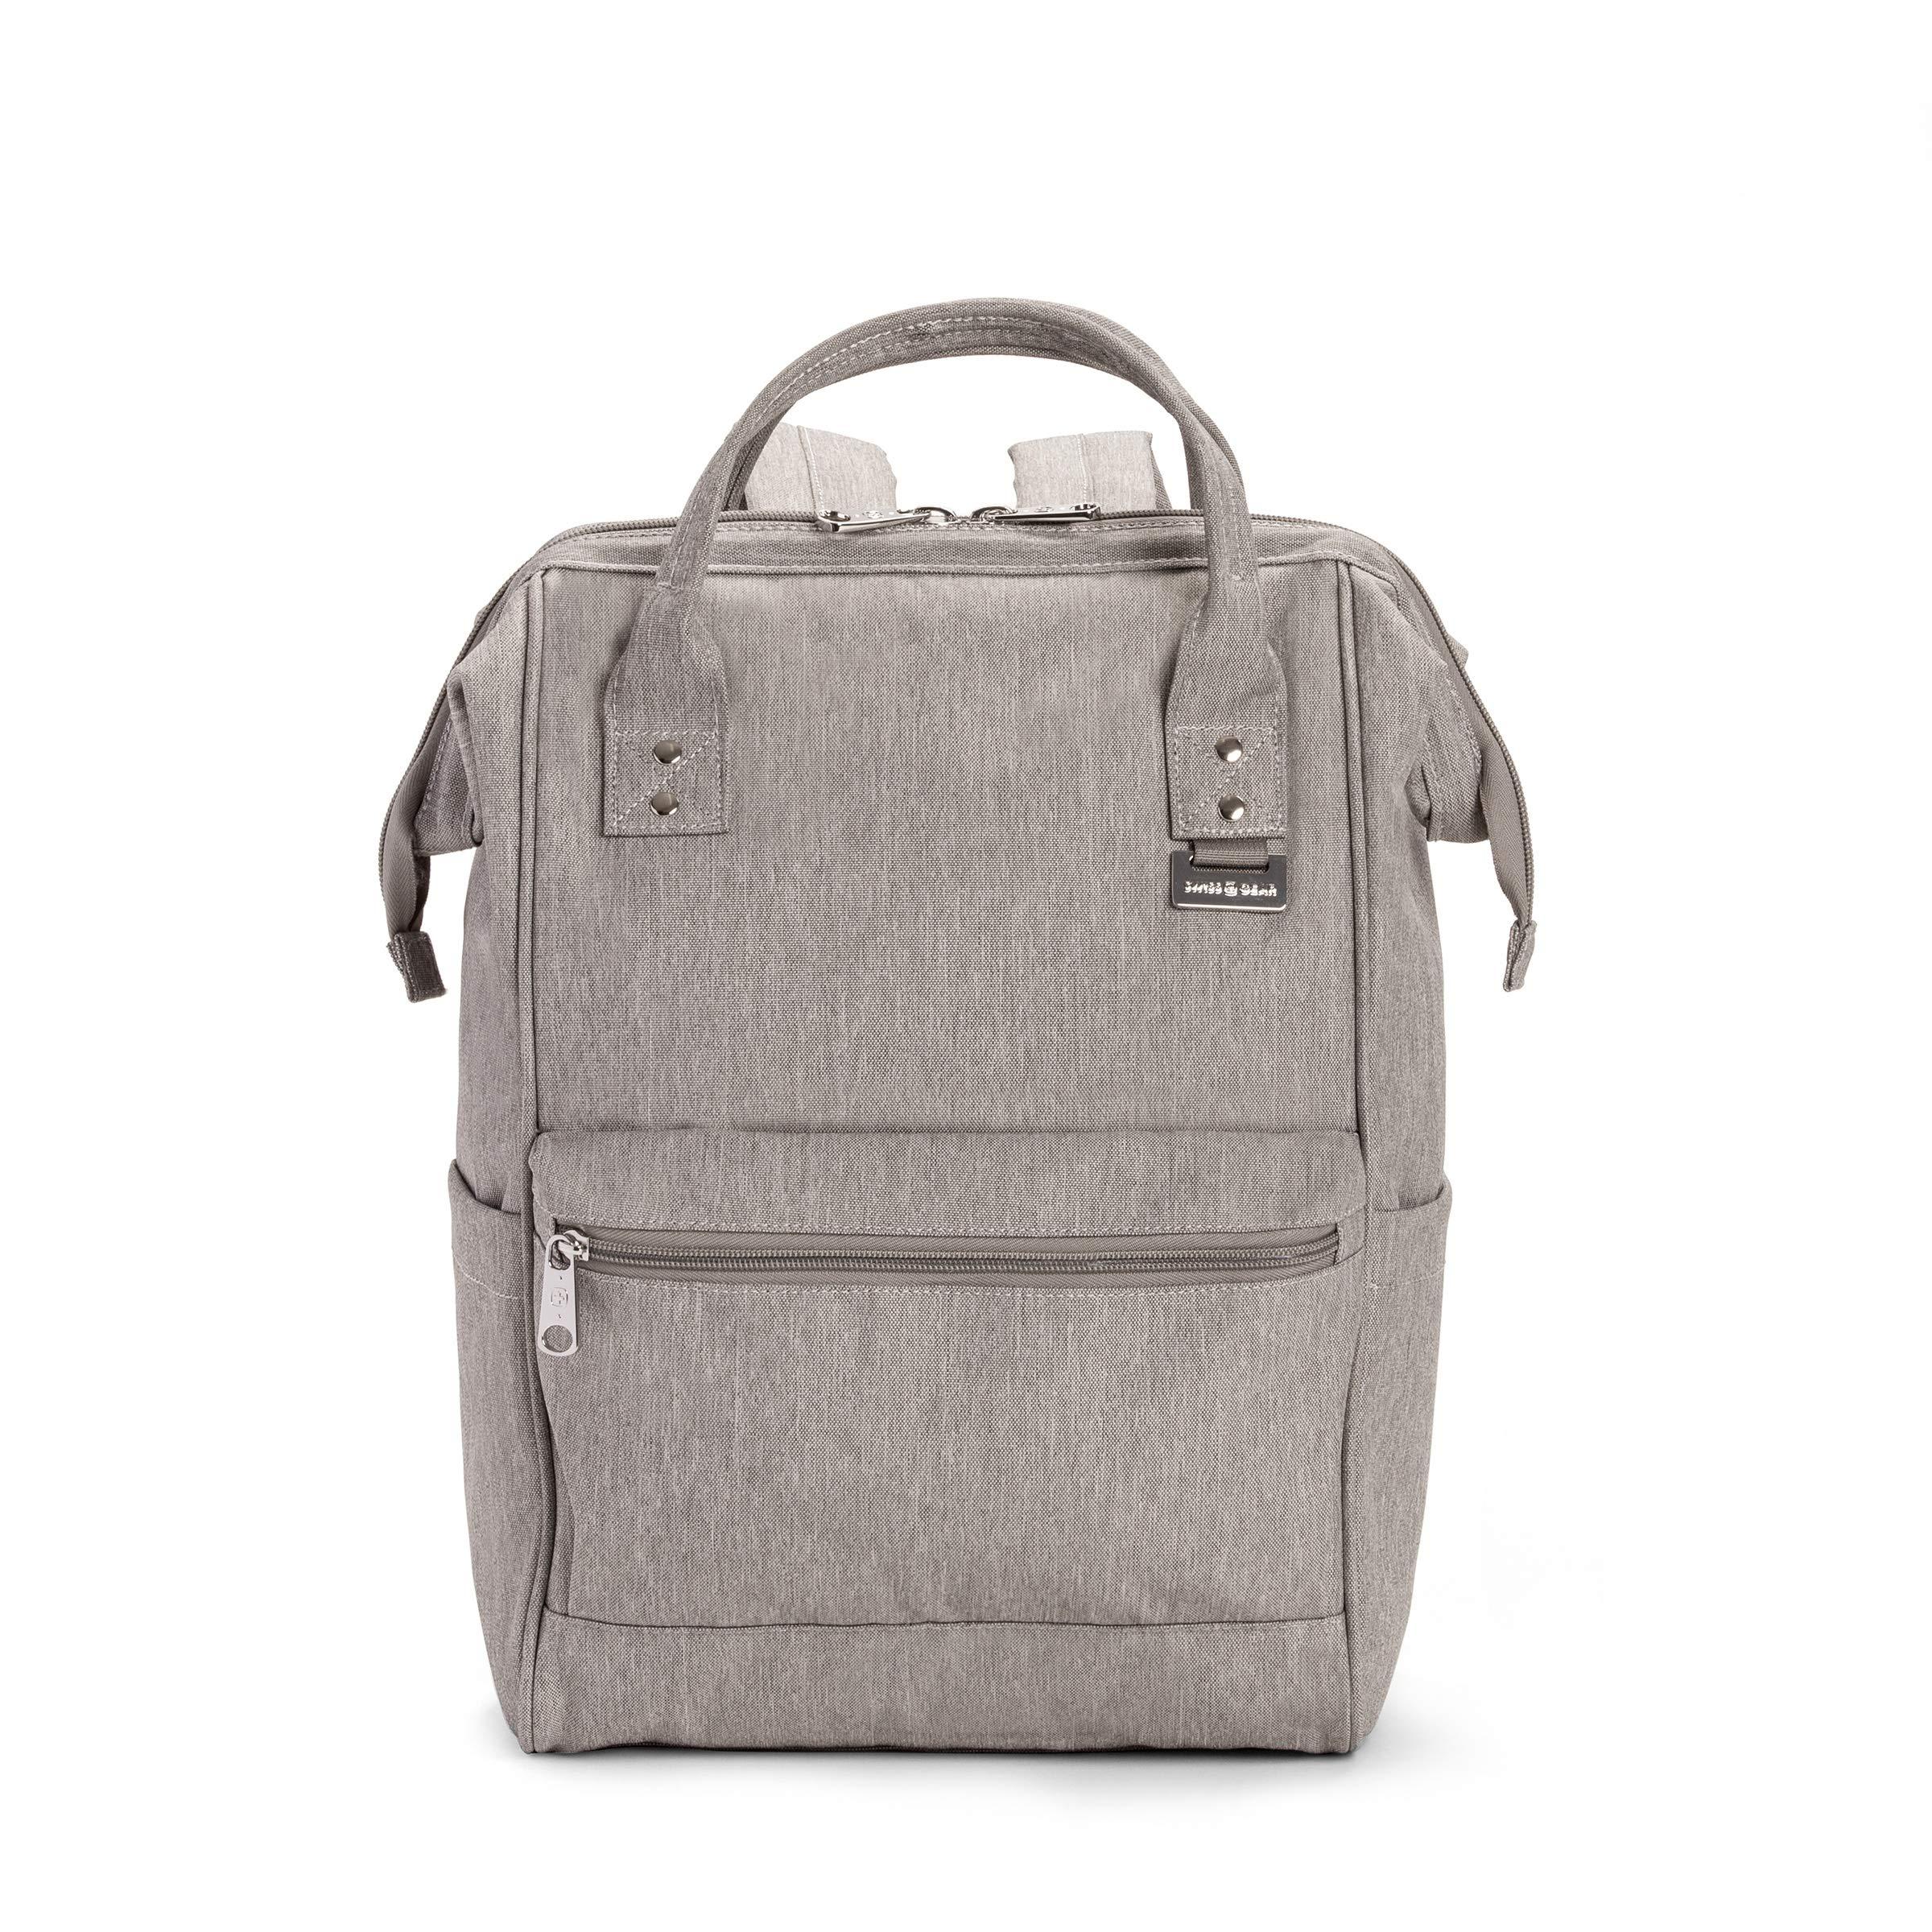 SWISSGEAR 3576 Artz Laptop Backpack. Vintage-Inspired Everyday Doctor Bag Backpack by Swiss Gear